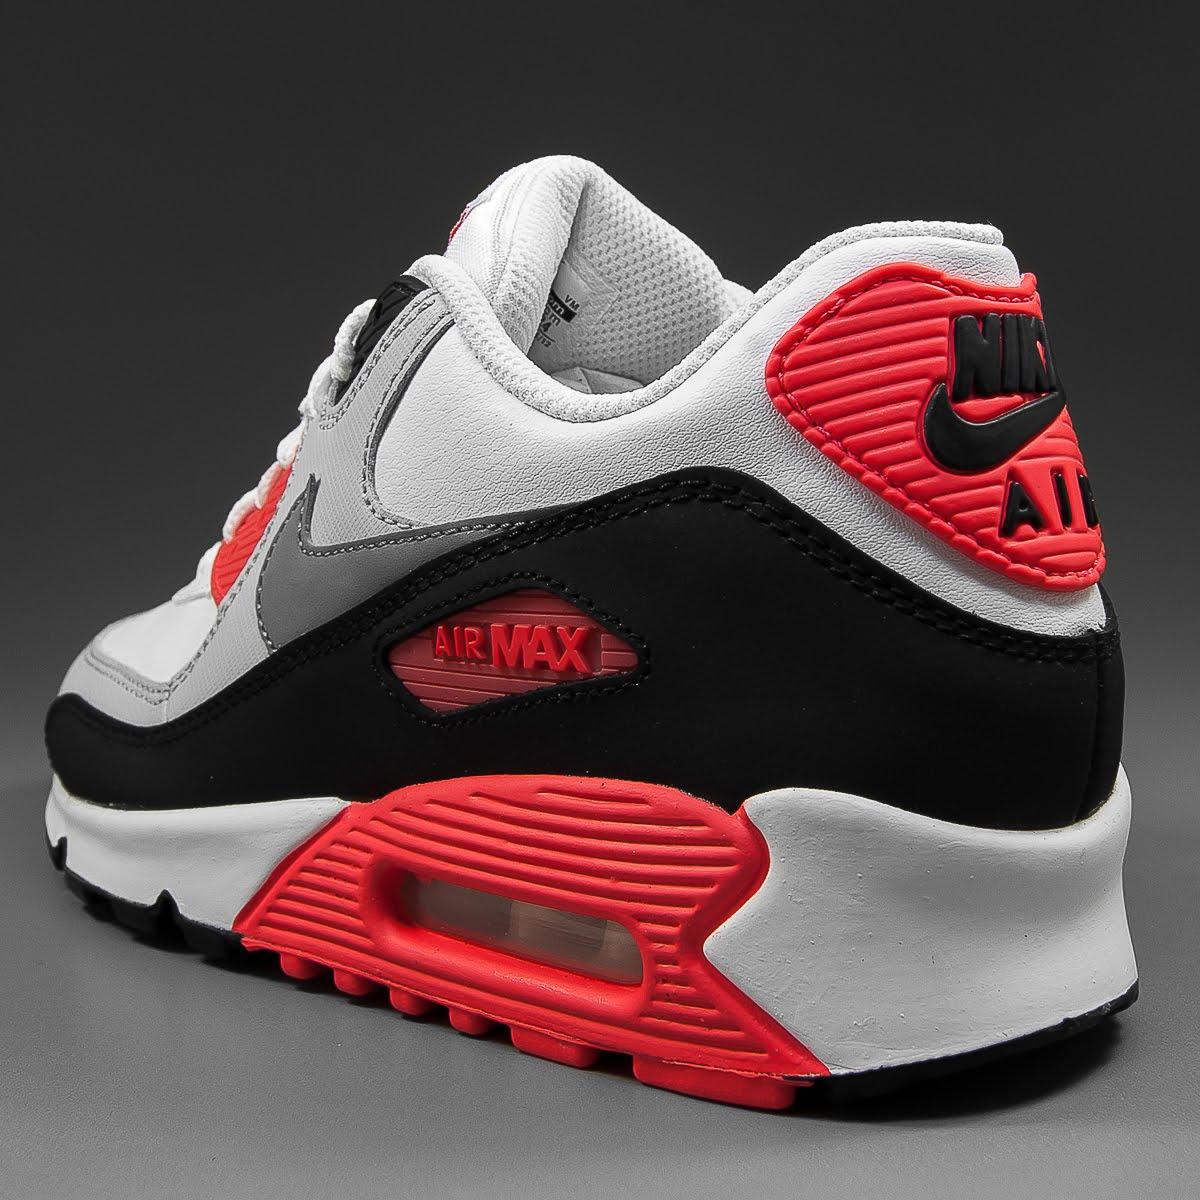 Solekitchen Nike Air Max 90 Gs Og White Grey Infrared